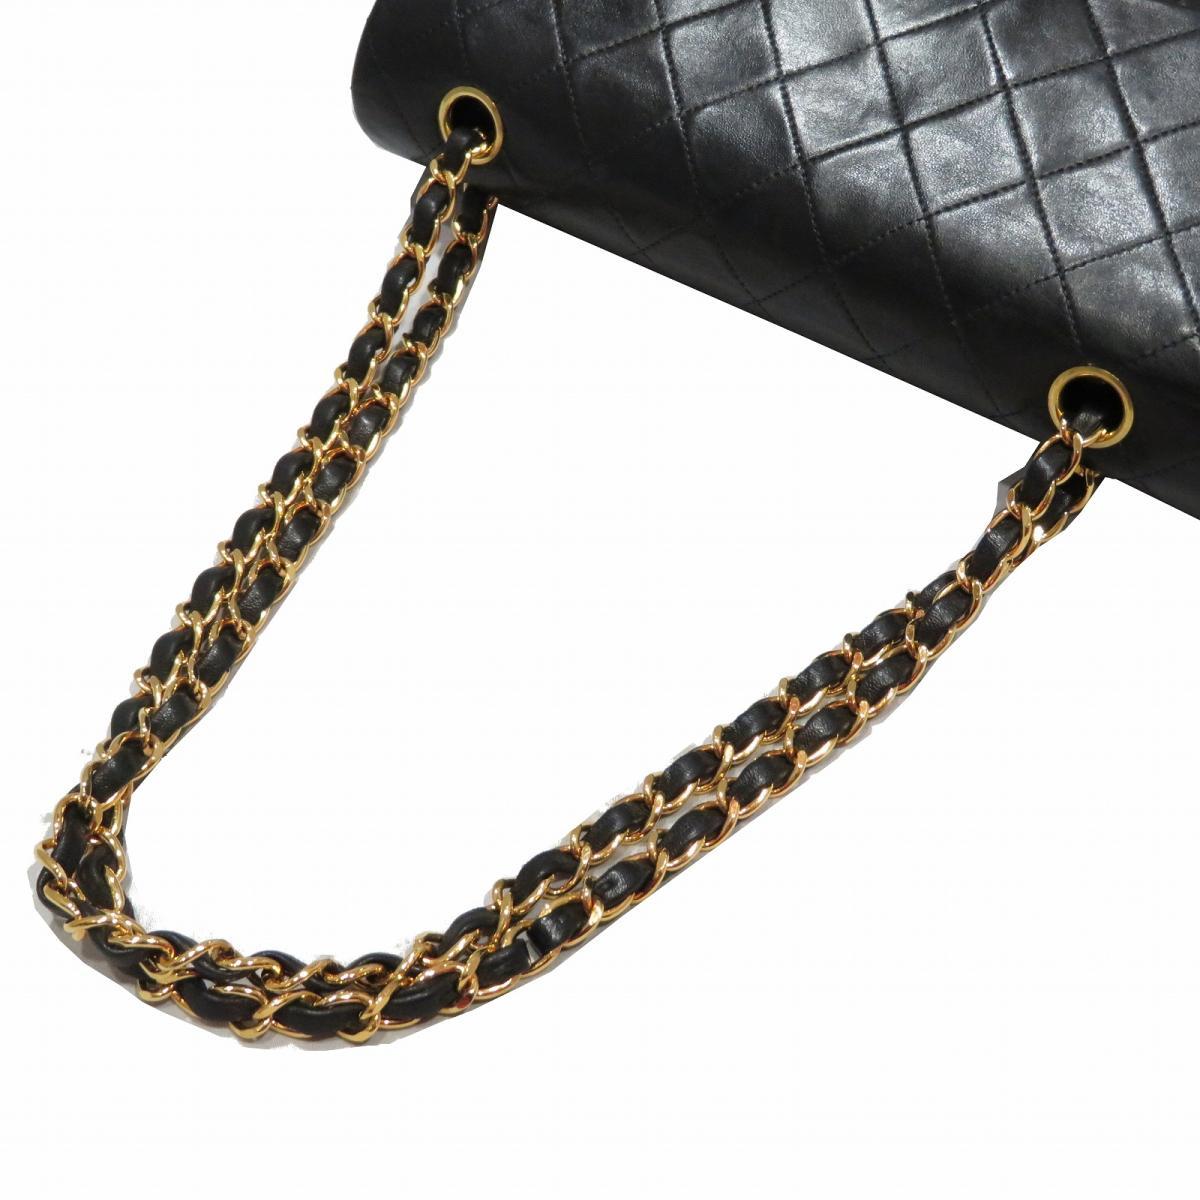 7fbc6a14092e Auth CHANEL Matelasse W flap chain shoulder bag lambskin leather Black Used  Vintage | BRANDOFF Ginza/TOKYO/Japan